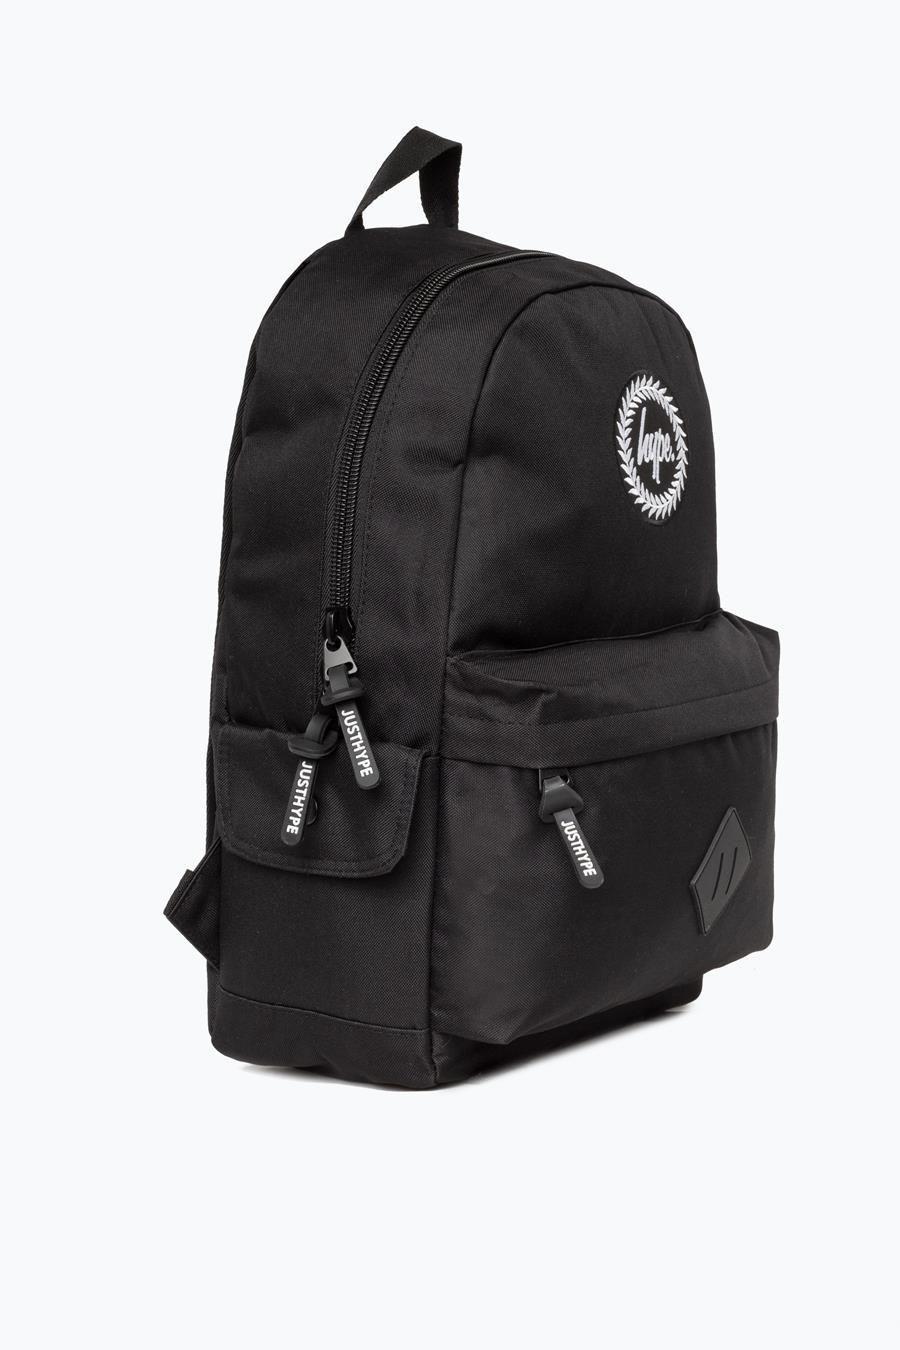 Hype Black Midi Backpack